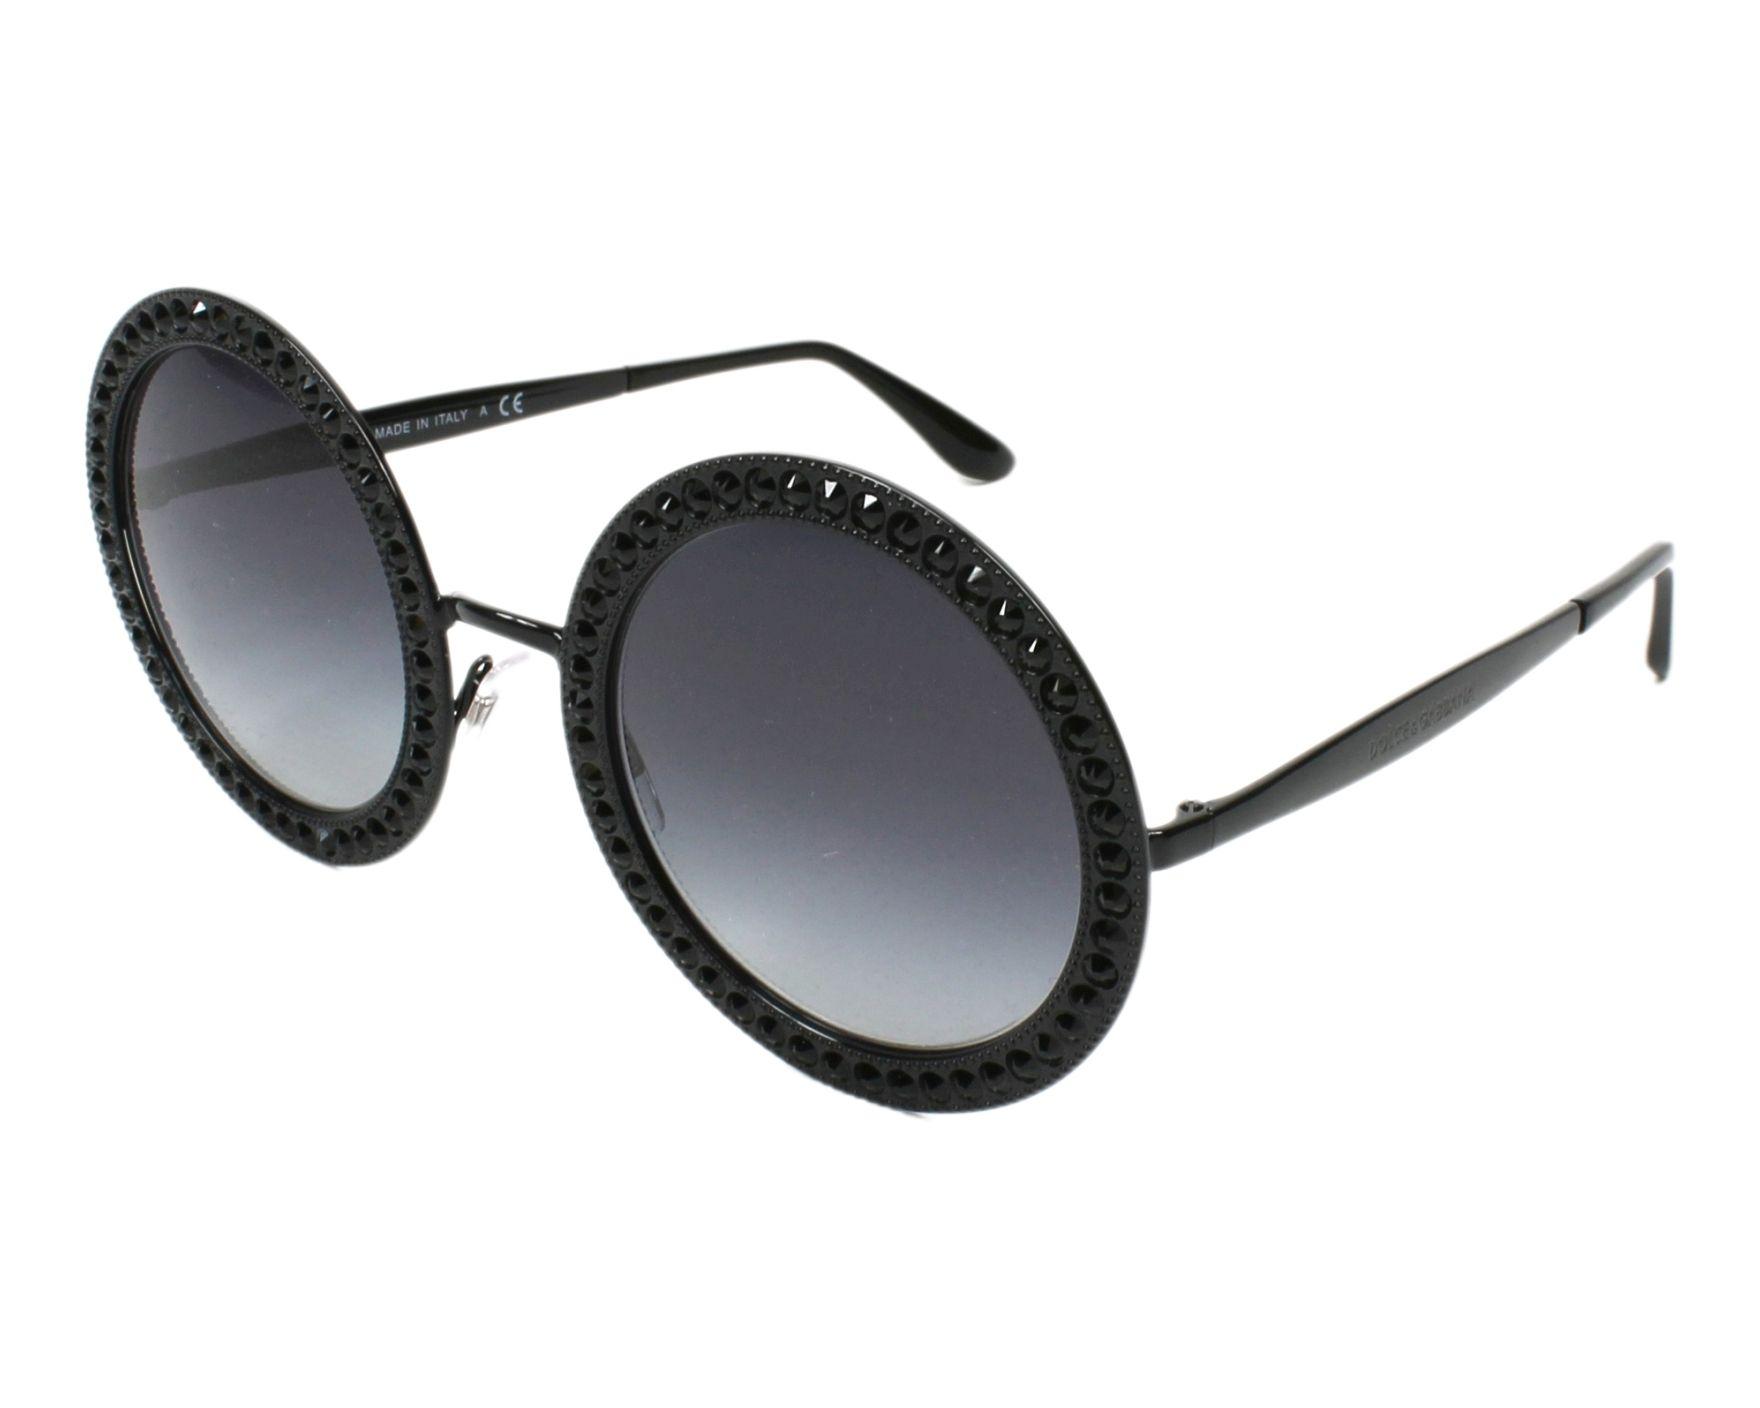 Dolce & Gabbana Sunglasses Black with Grey Lenses DG-2170-B 01/8G ...